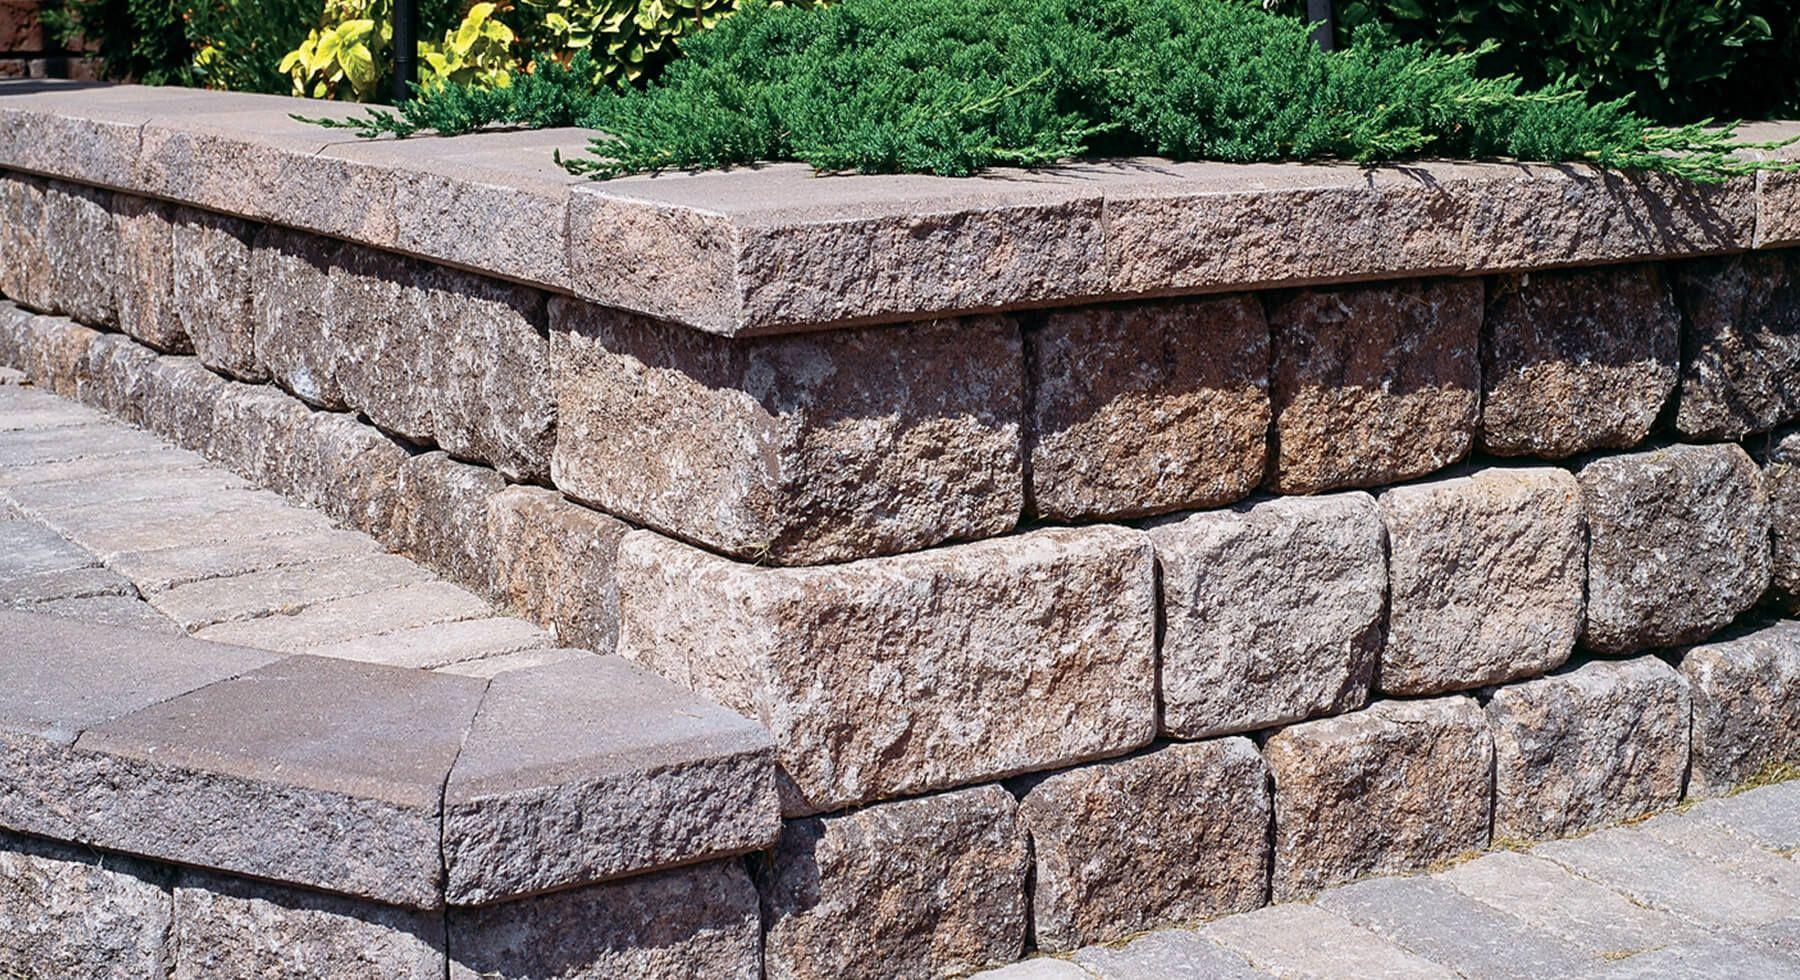 Precast Concrete Retaining Wall Blocks 33 With Precast Concrete Within Precast Concrete Retaining Retaining Wall Blocks Concrete Retaining Walls Retaining Wall